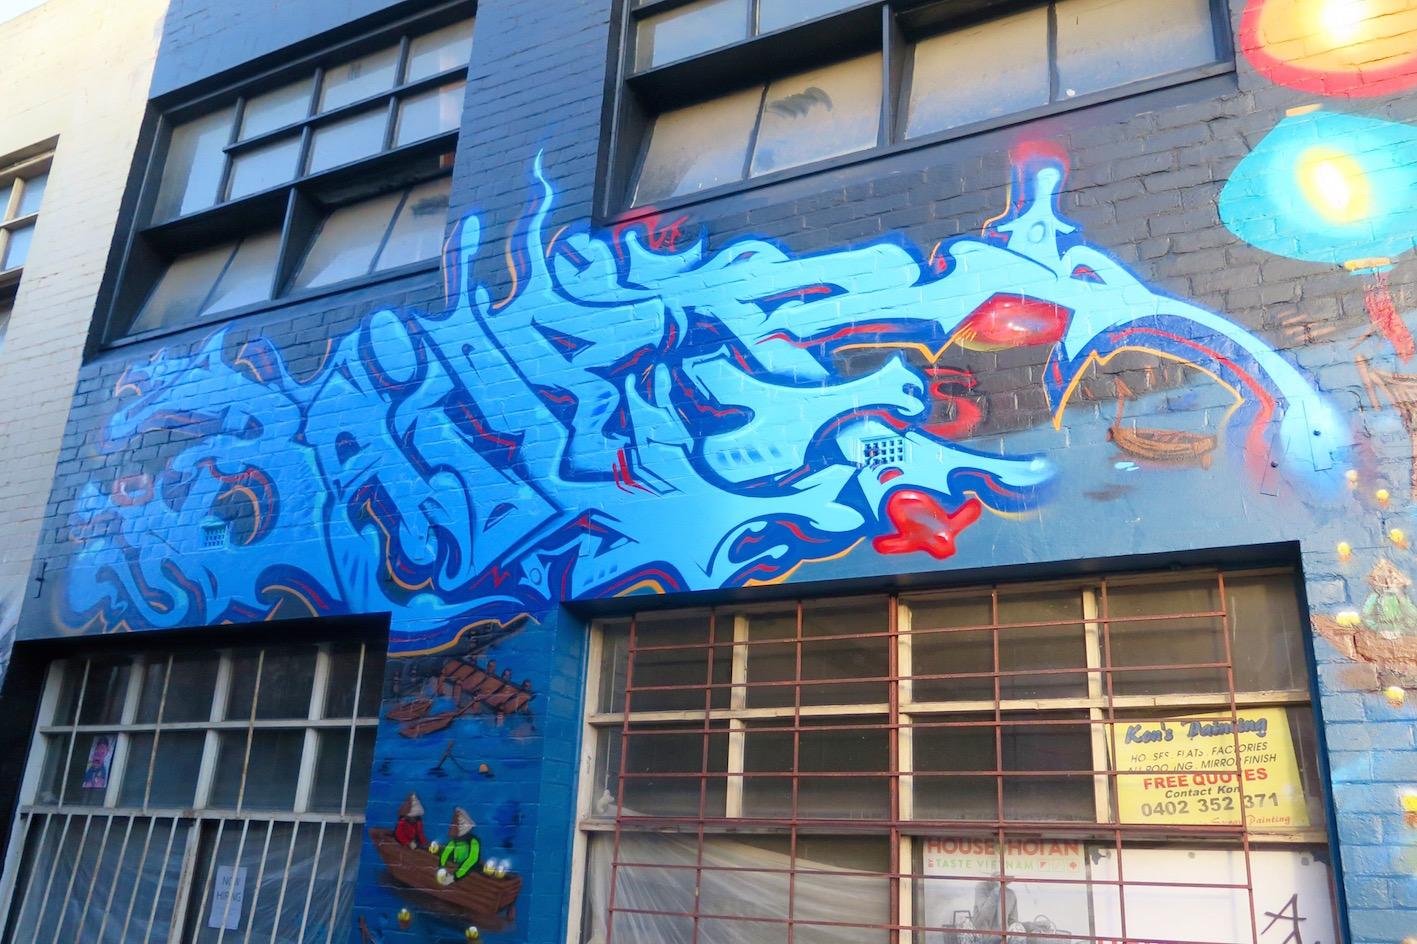 deansunshine_landofsunshine_melbourne_streetart_graffiti_bailer siege windsor 4